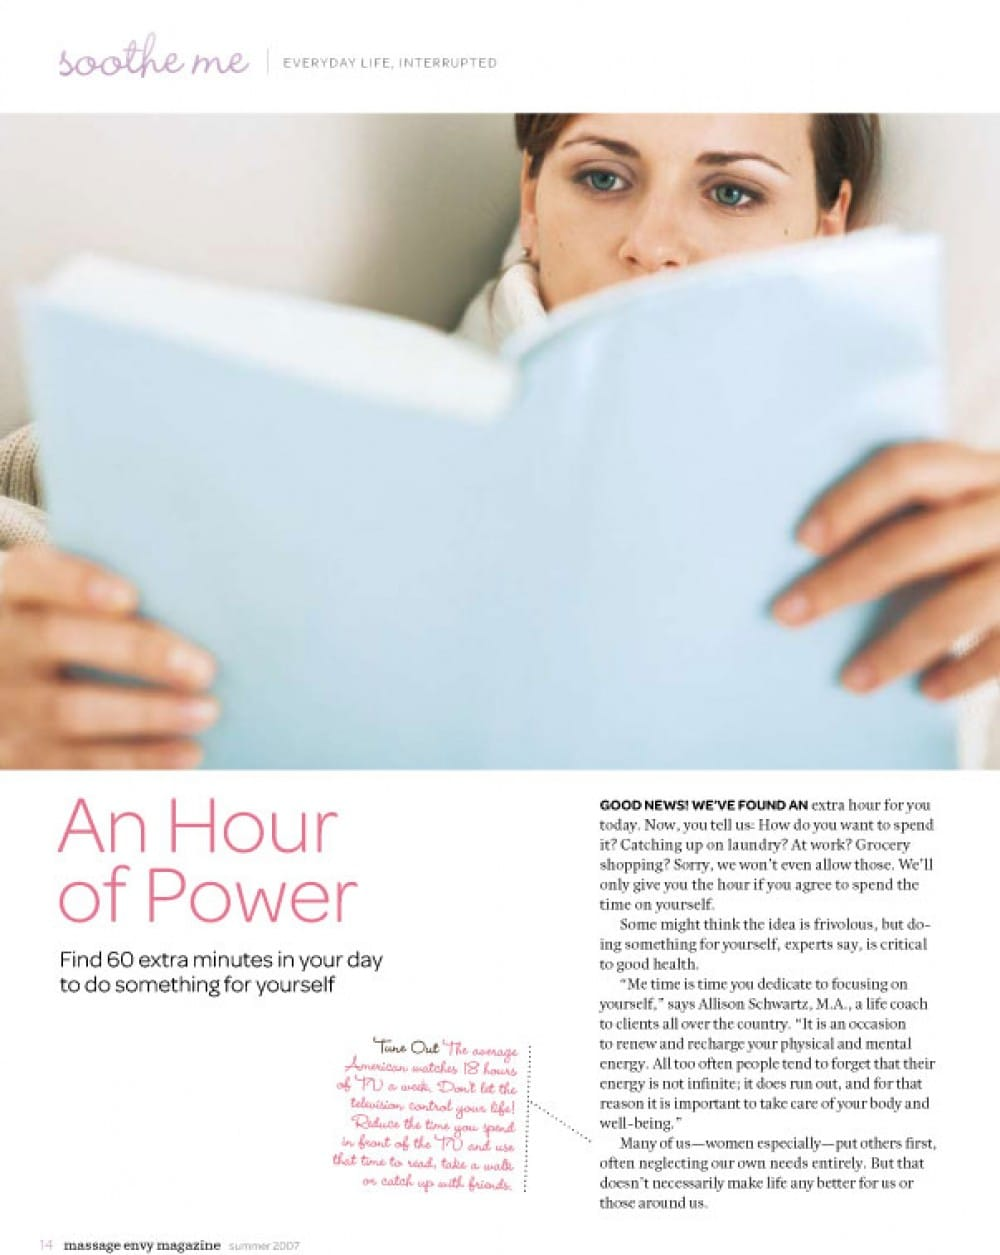 An-Hour-of-Power_ME-11-e1351273732401